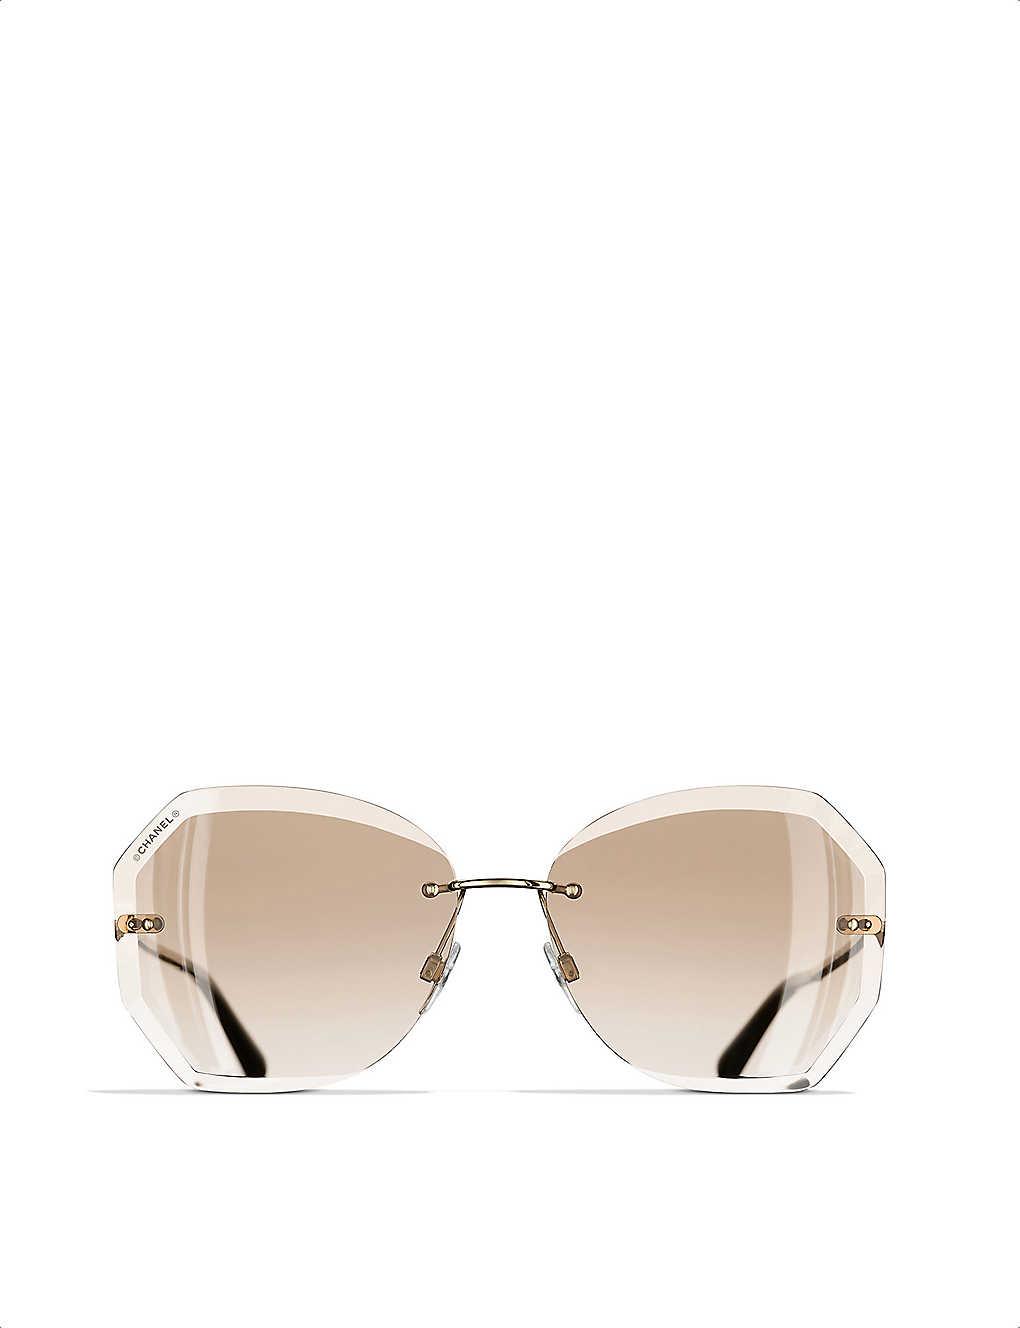 6b290d1f Round sunglasses